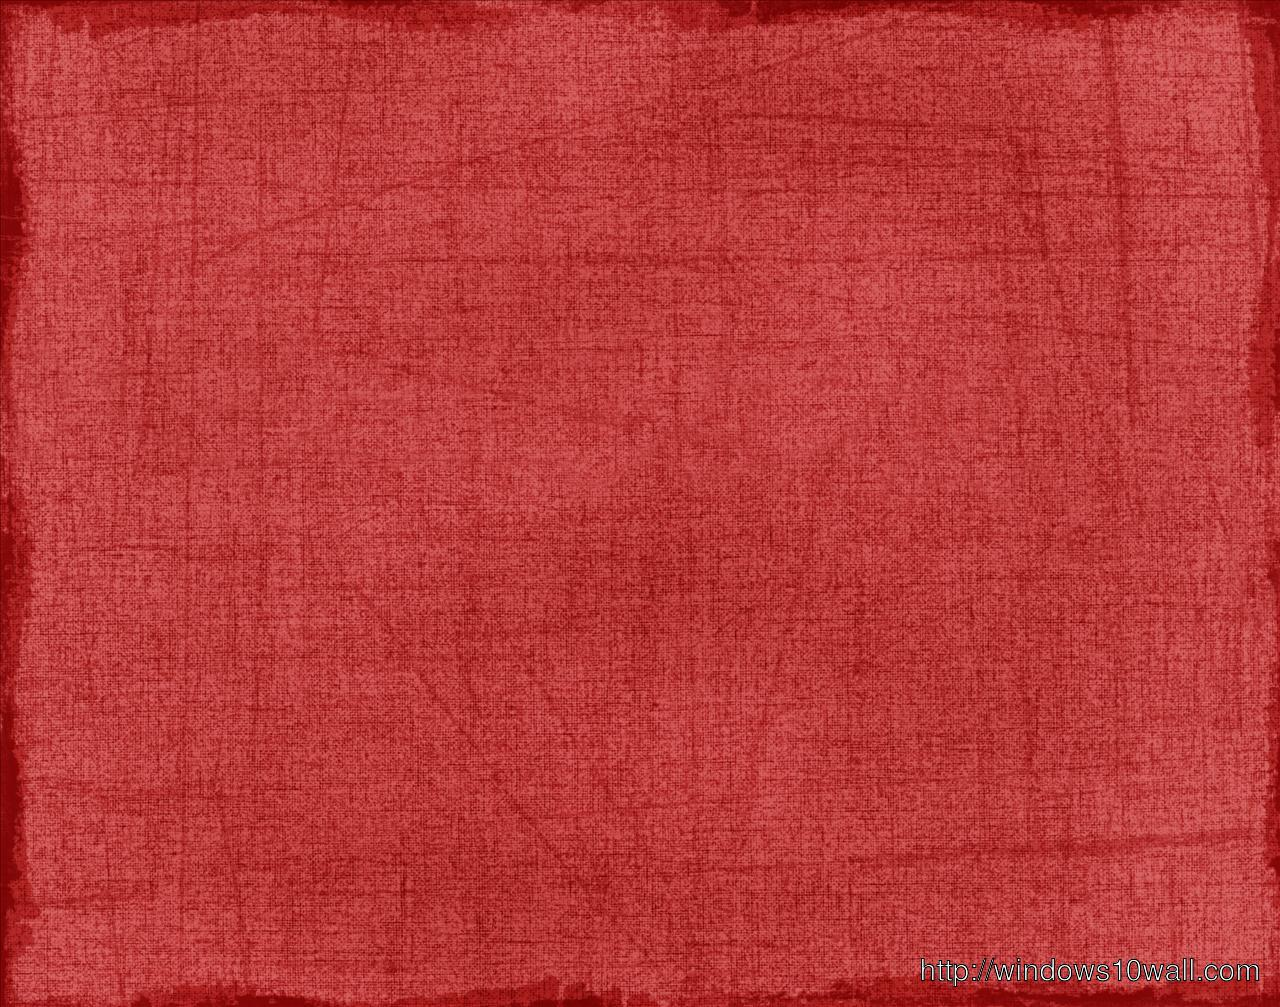 Vintage Reddish Style Background Wallpaper